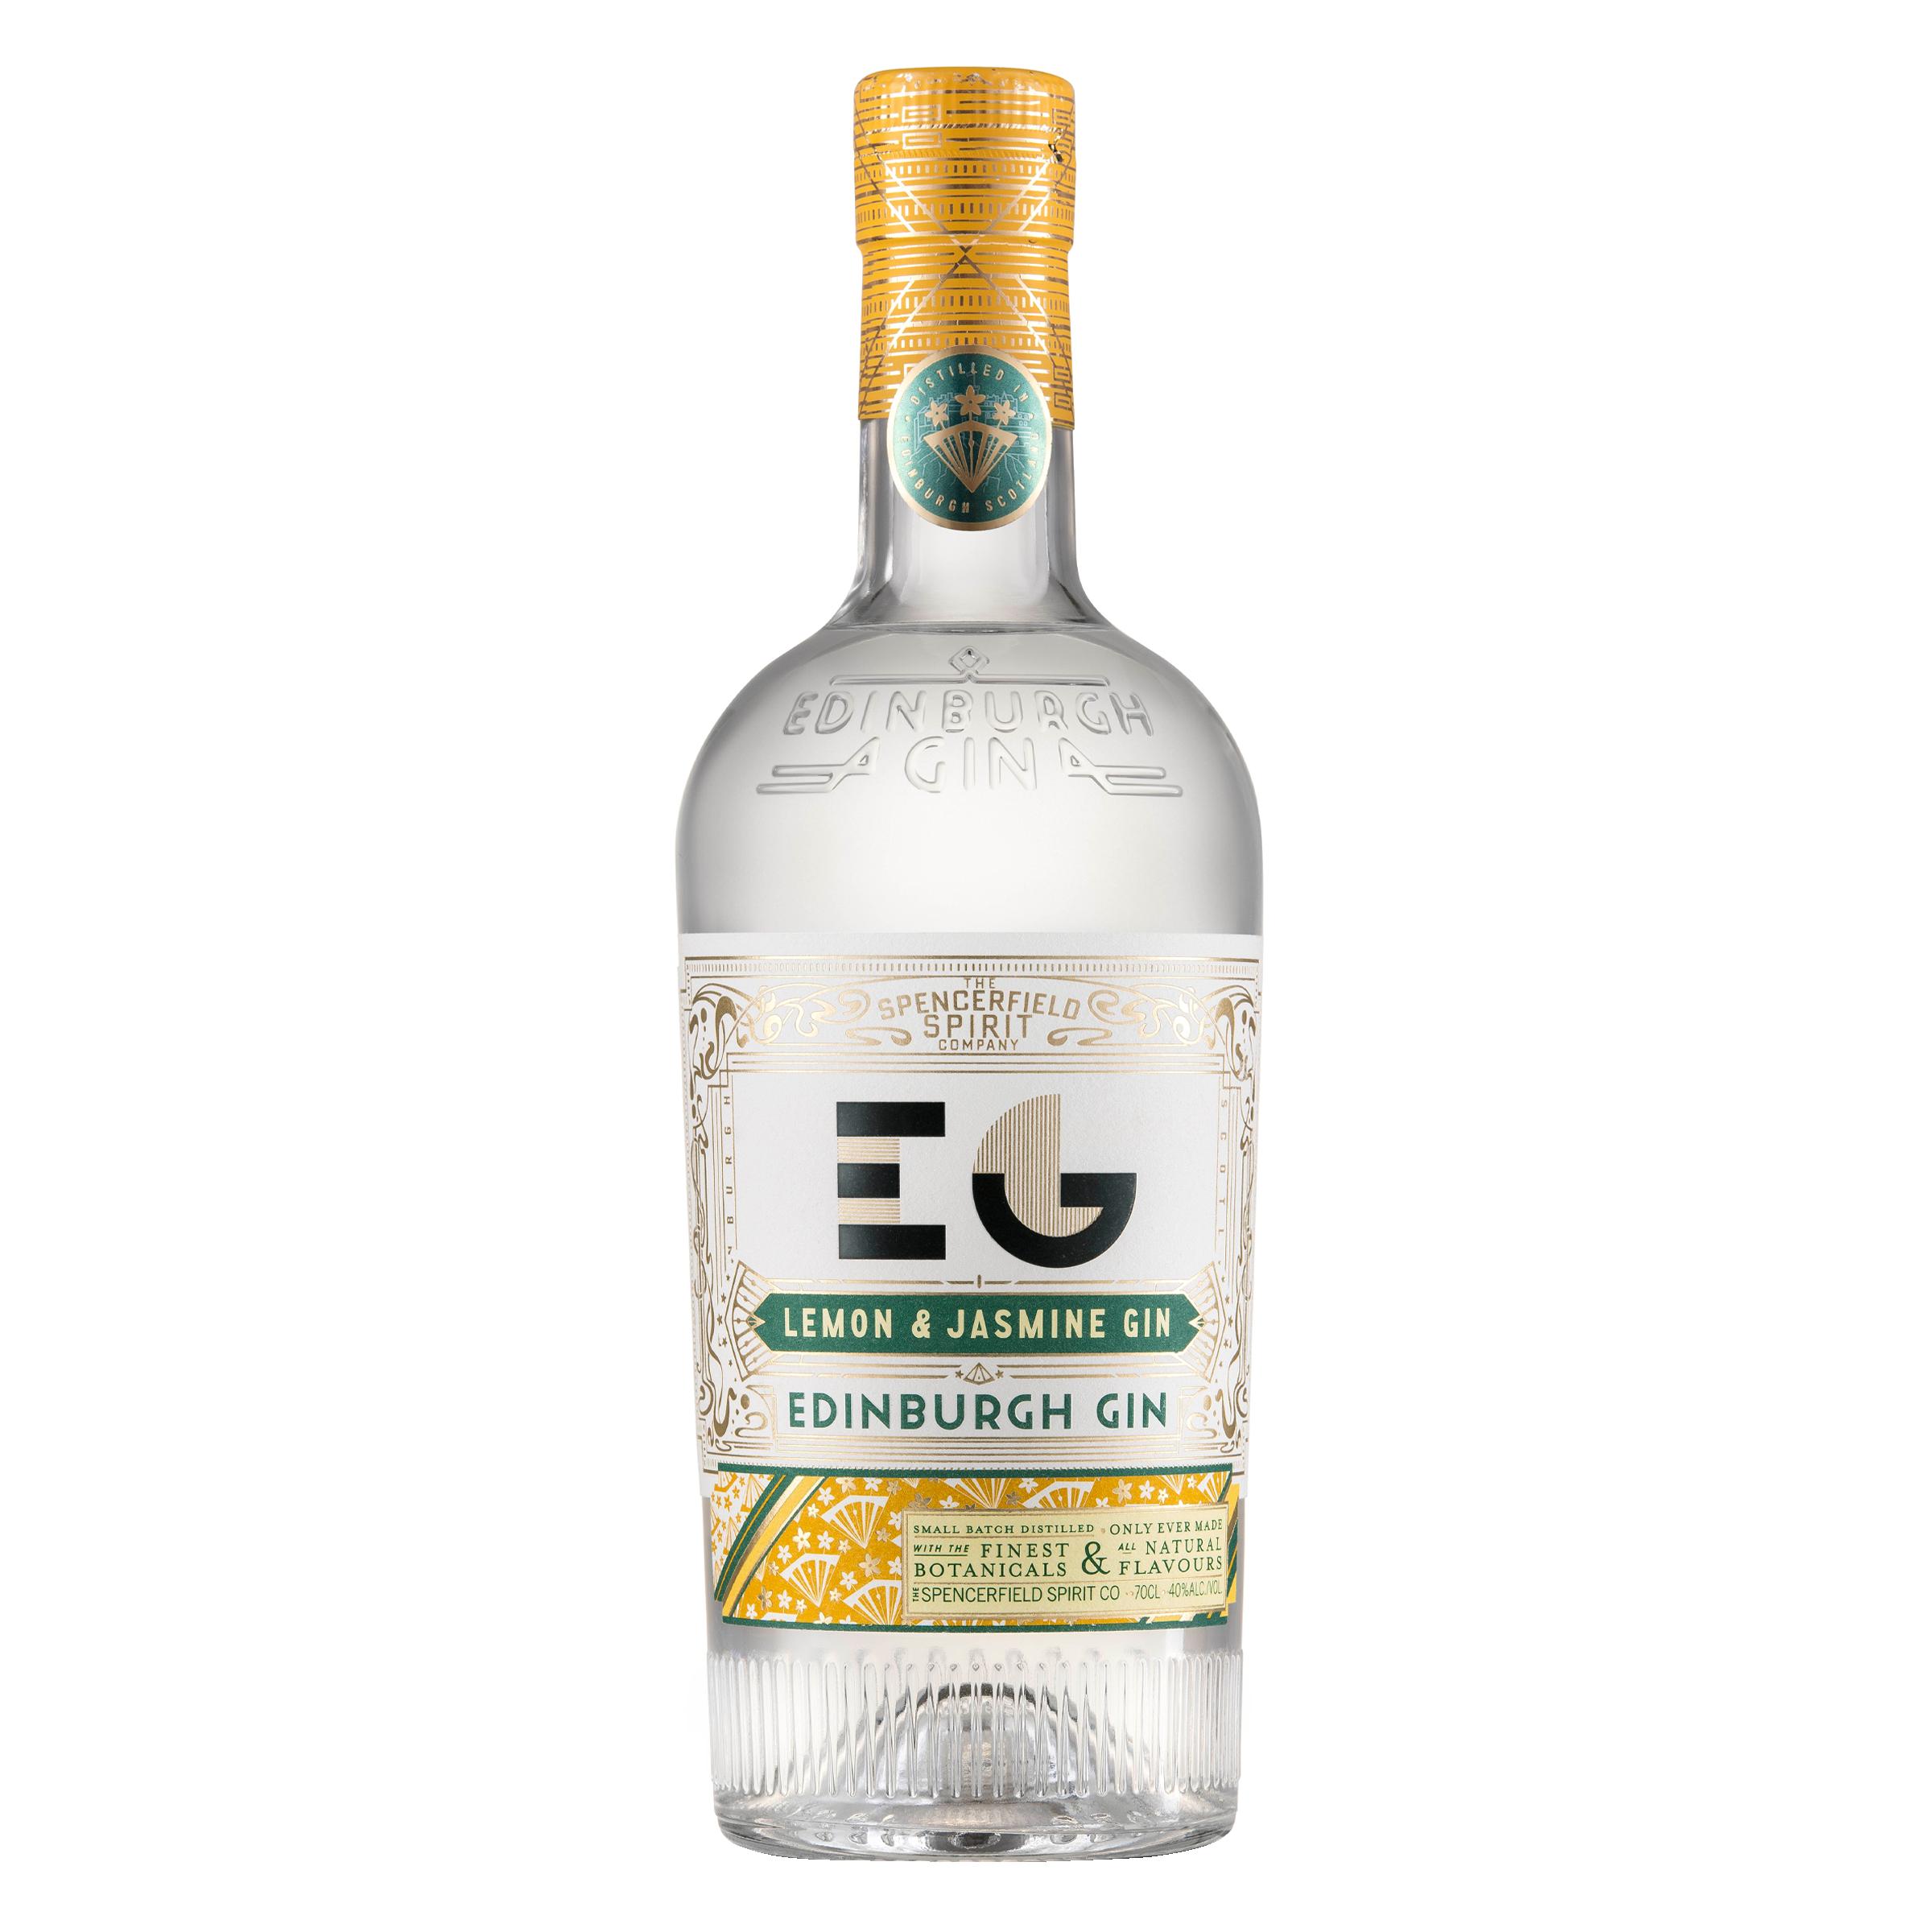 Edinburgh Lemon & Jasmine Gin 700ml